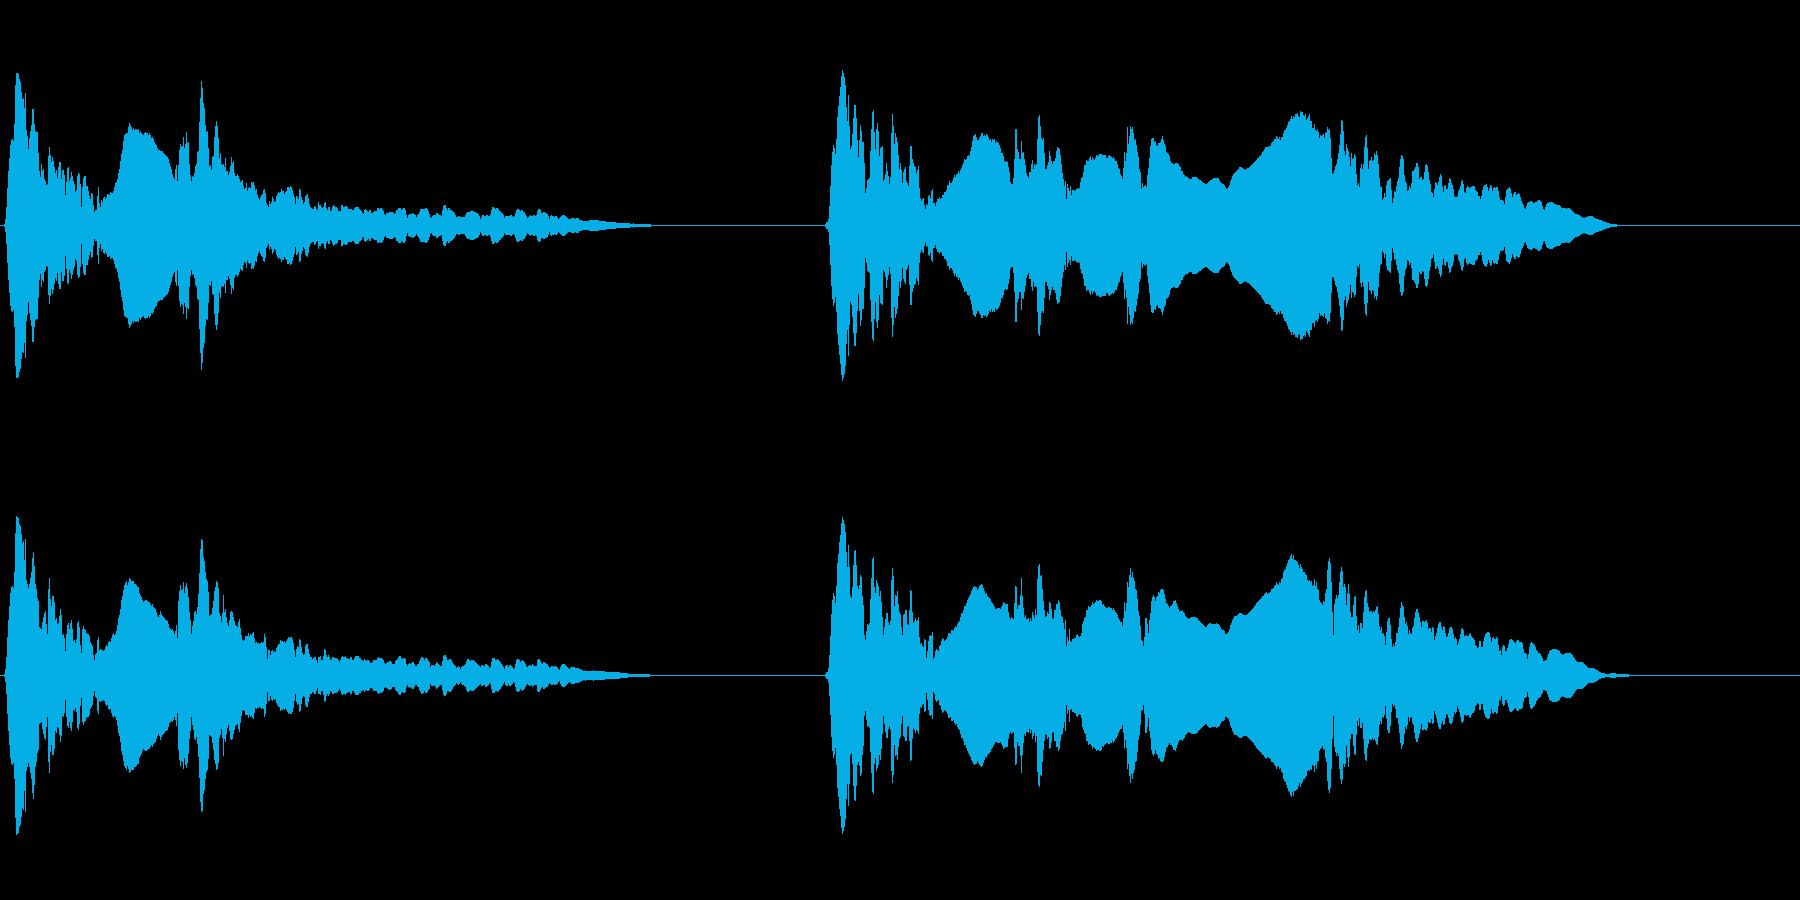 尺八 生演奏 古典風 残響音有 7の再生済みの波形